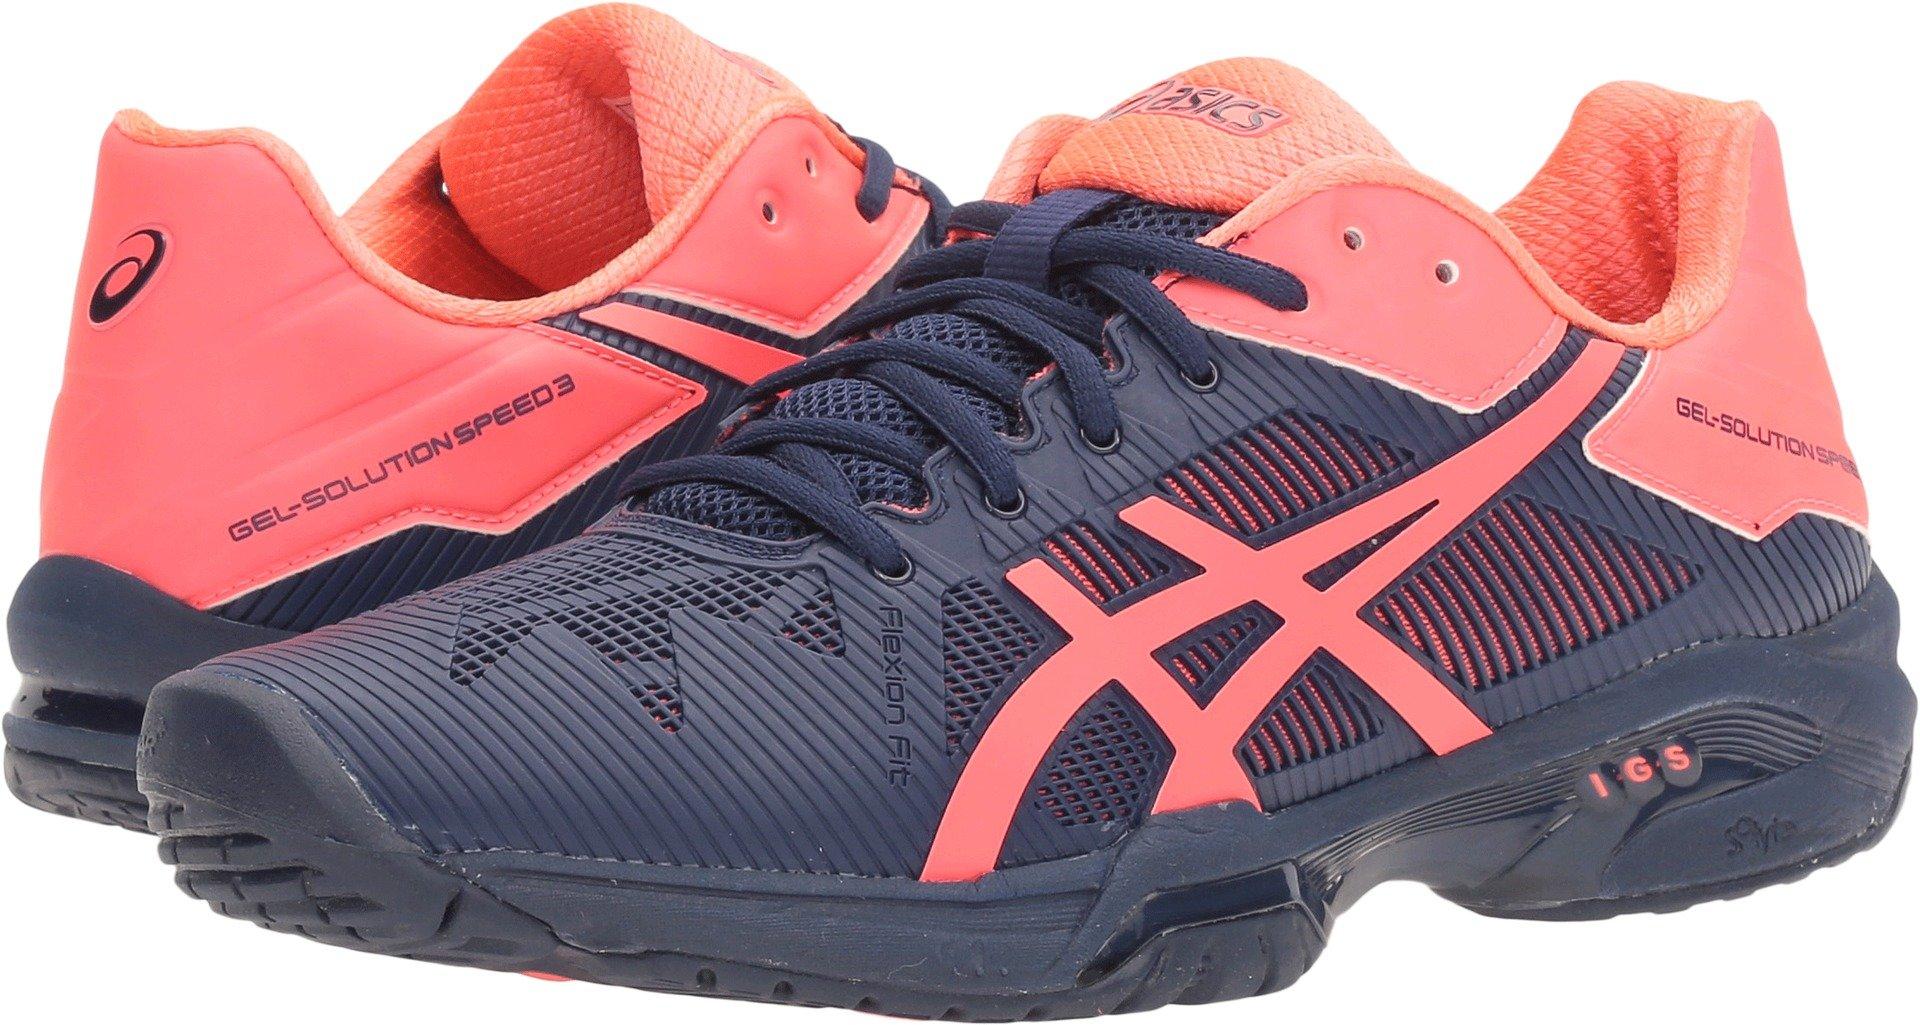 ASICS Women's Gel-Solution Speed 3 Tennis Shoe, Indigo Blue/Diva Pink, 6 M US